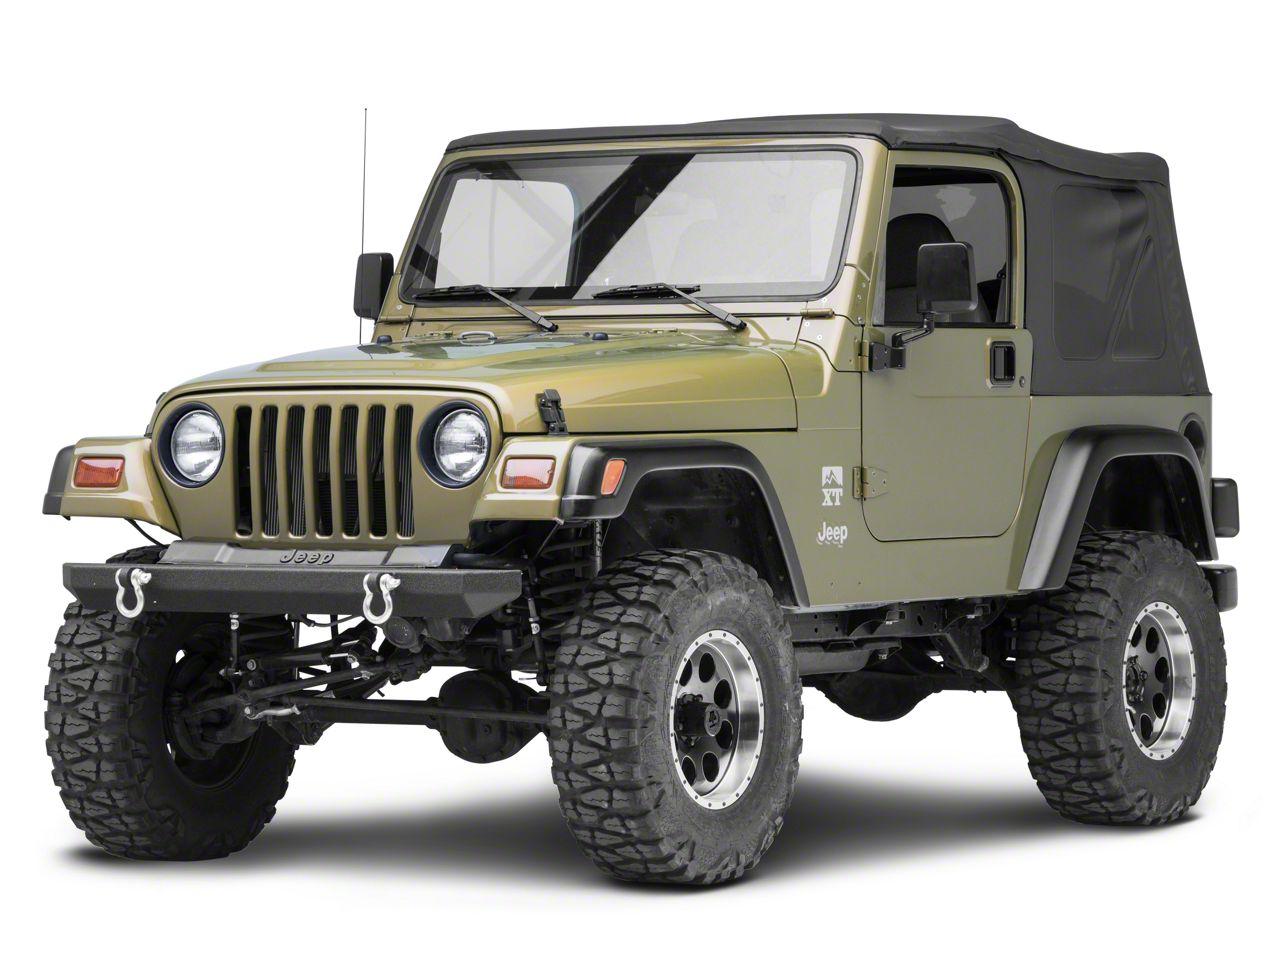 Smittybilt SRC Rock Crawler Classic Front Bumper w/ D-Rings (87-06 Jeep Wrangler YJ & TJ)